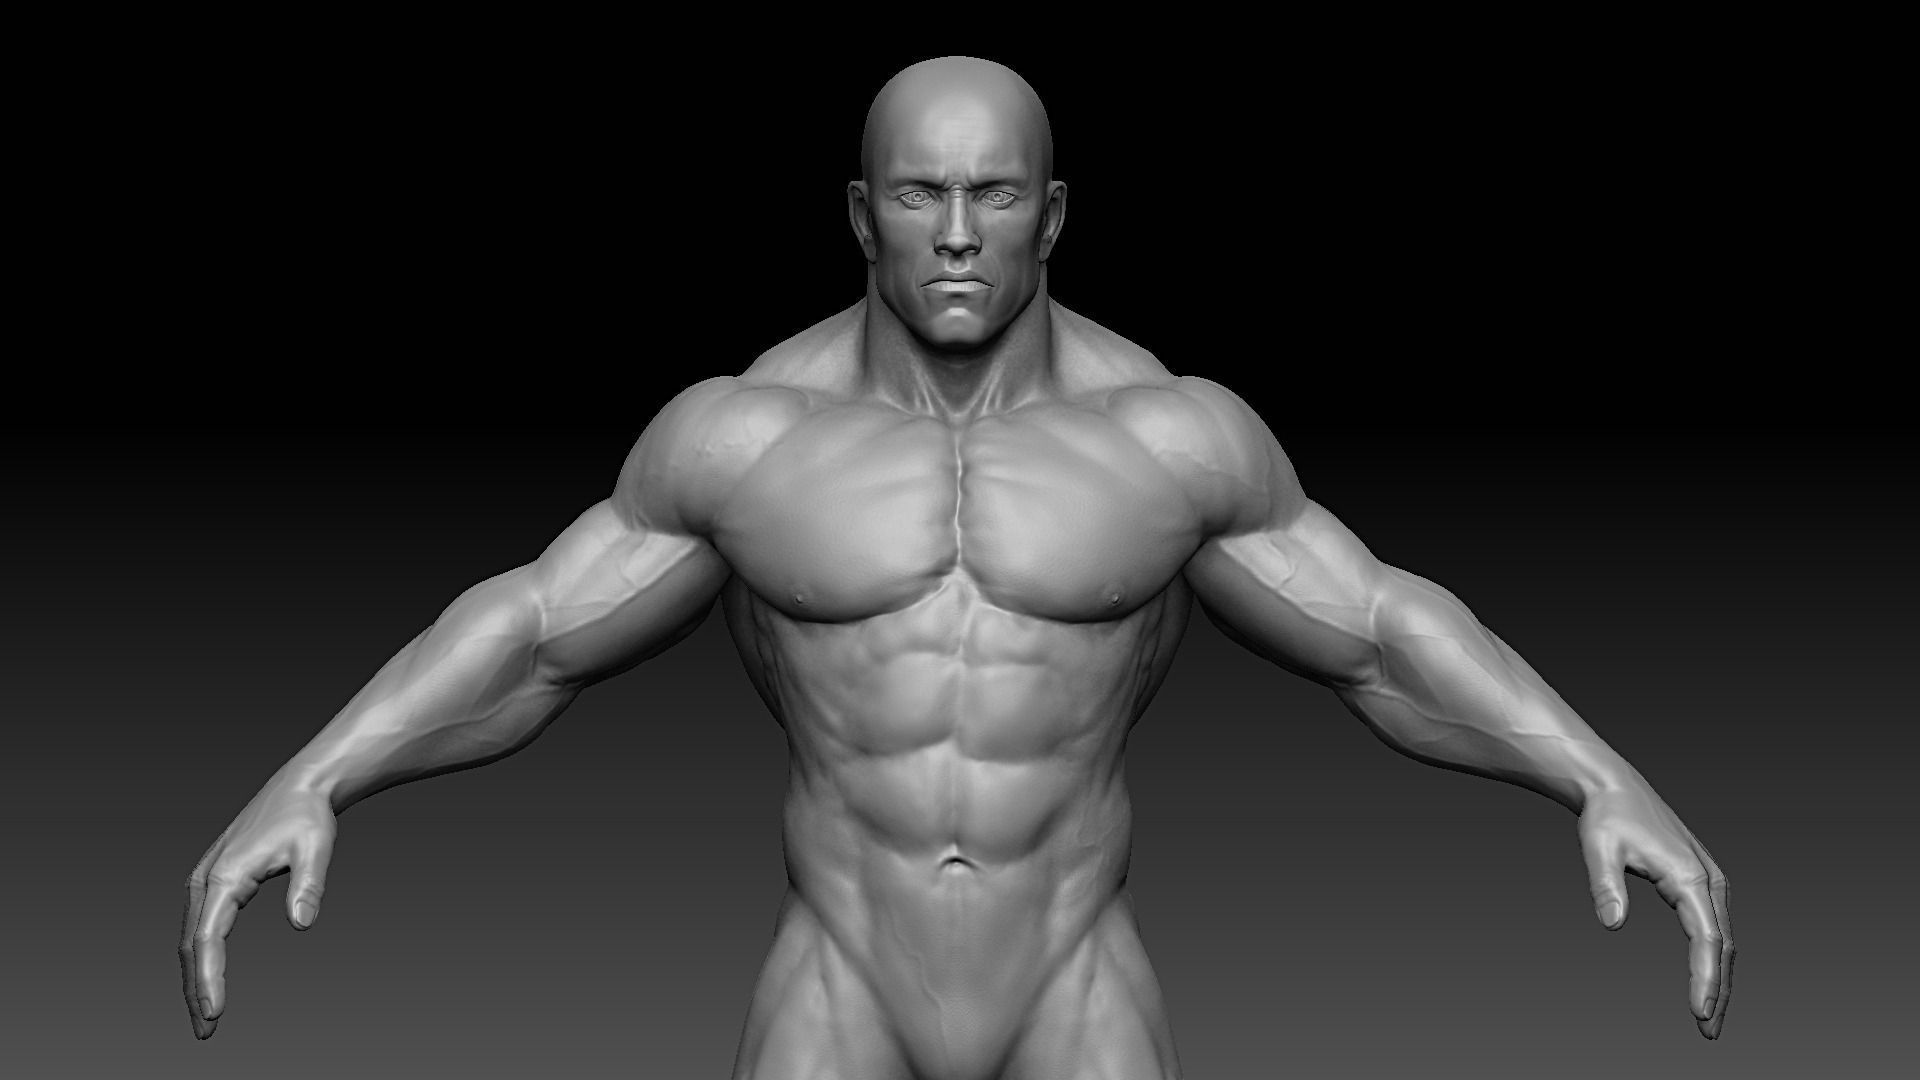 Muscular Male Body 3d Asset Cgtrader